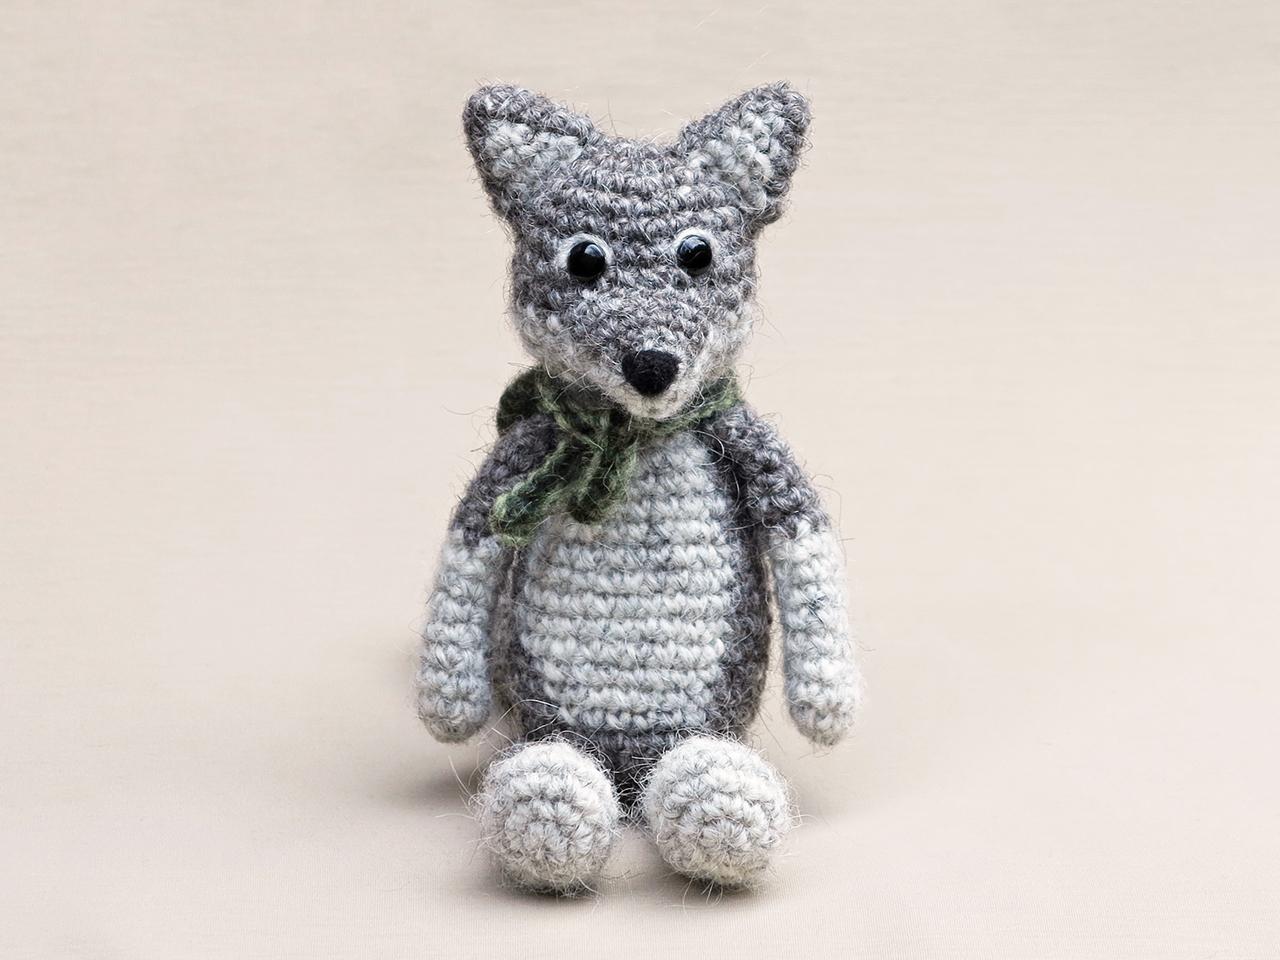 Amigurumi Wolf Crochet Pattern, cute stuffed animal, digital ... | 960x1280